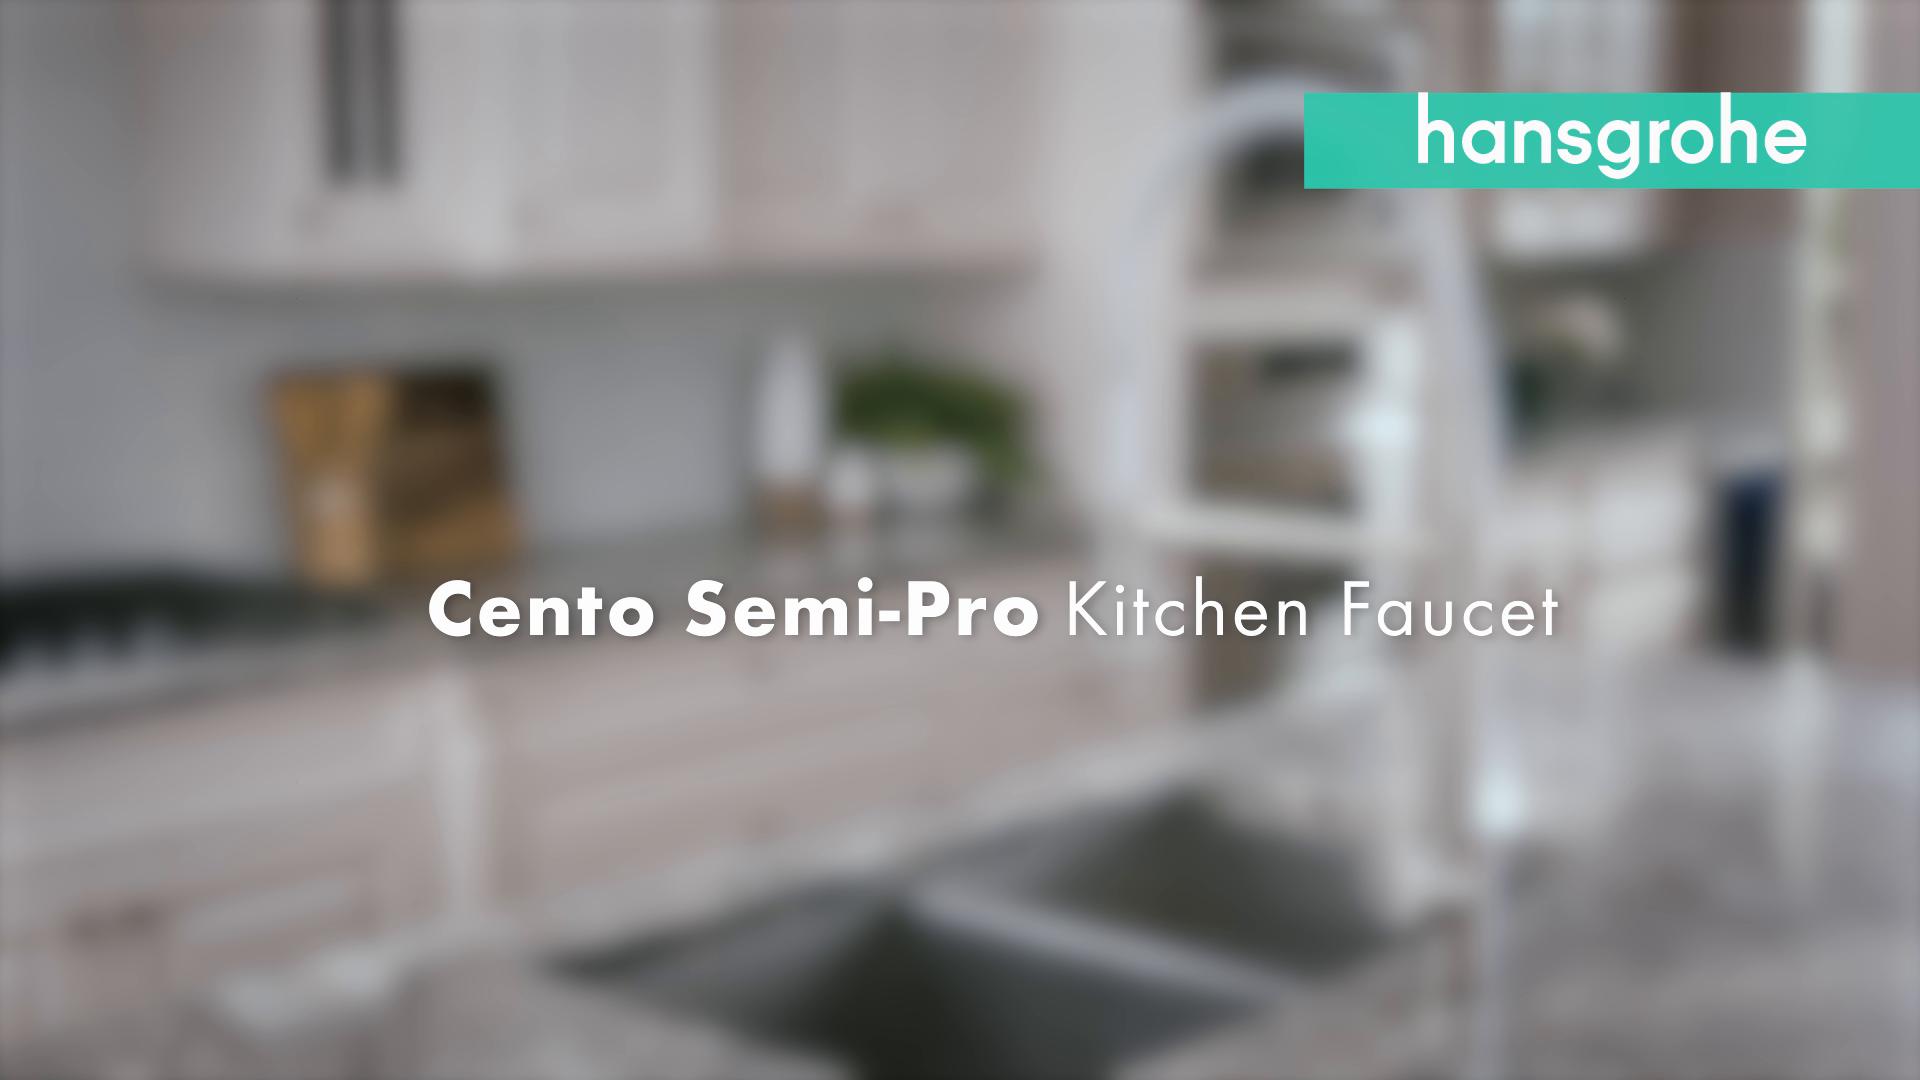 Hansgrohe Cento Semi Pro Kitchen Faucet